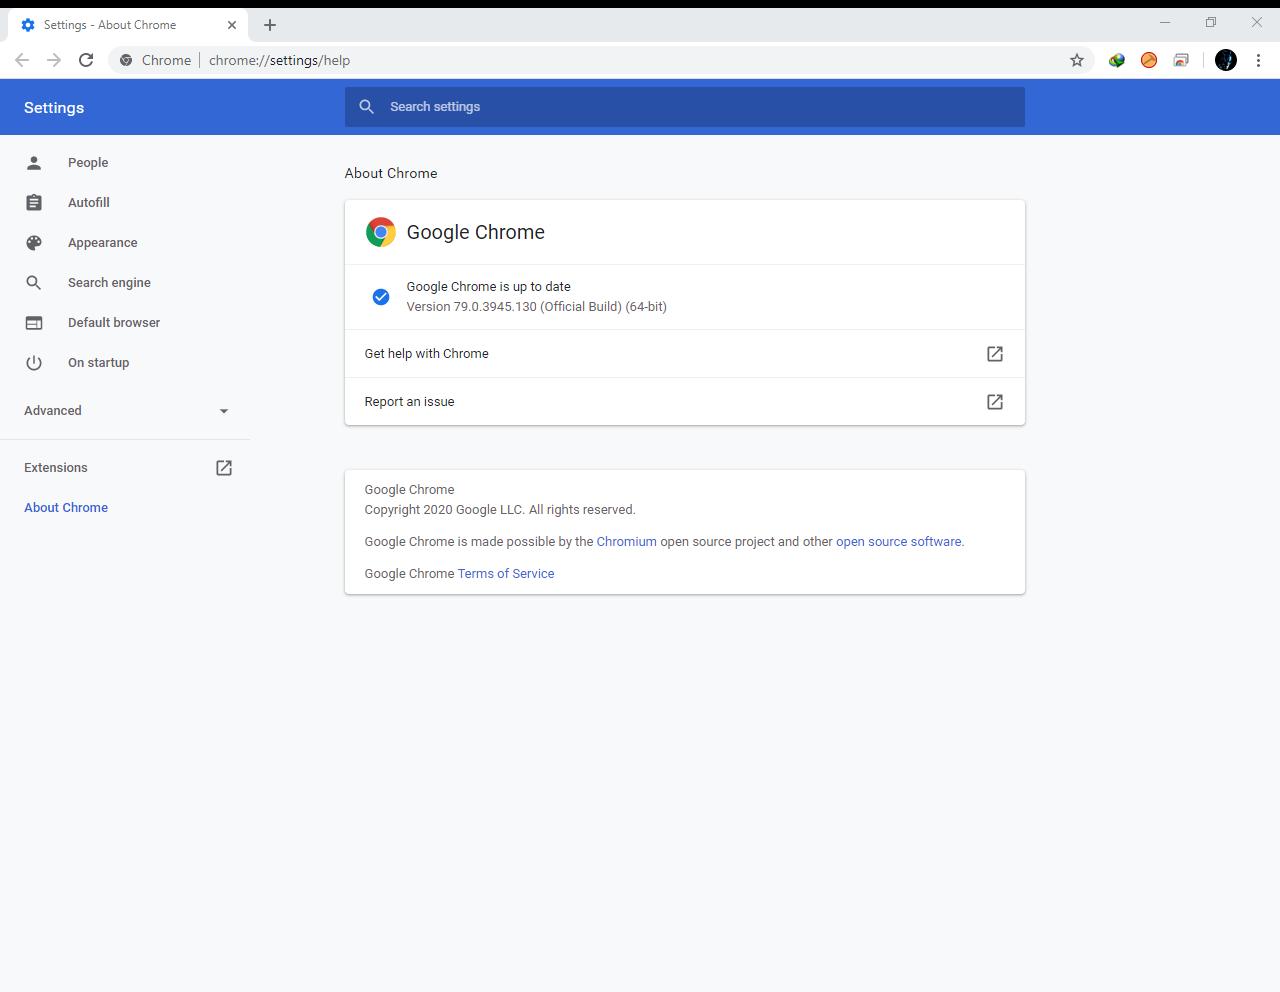 Google Chrome Browser 79.0.3945.130